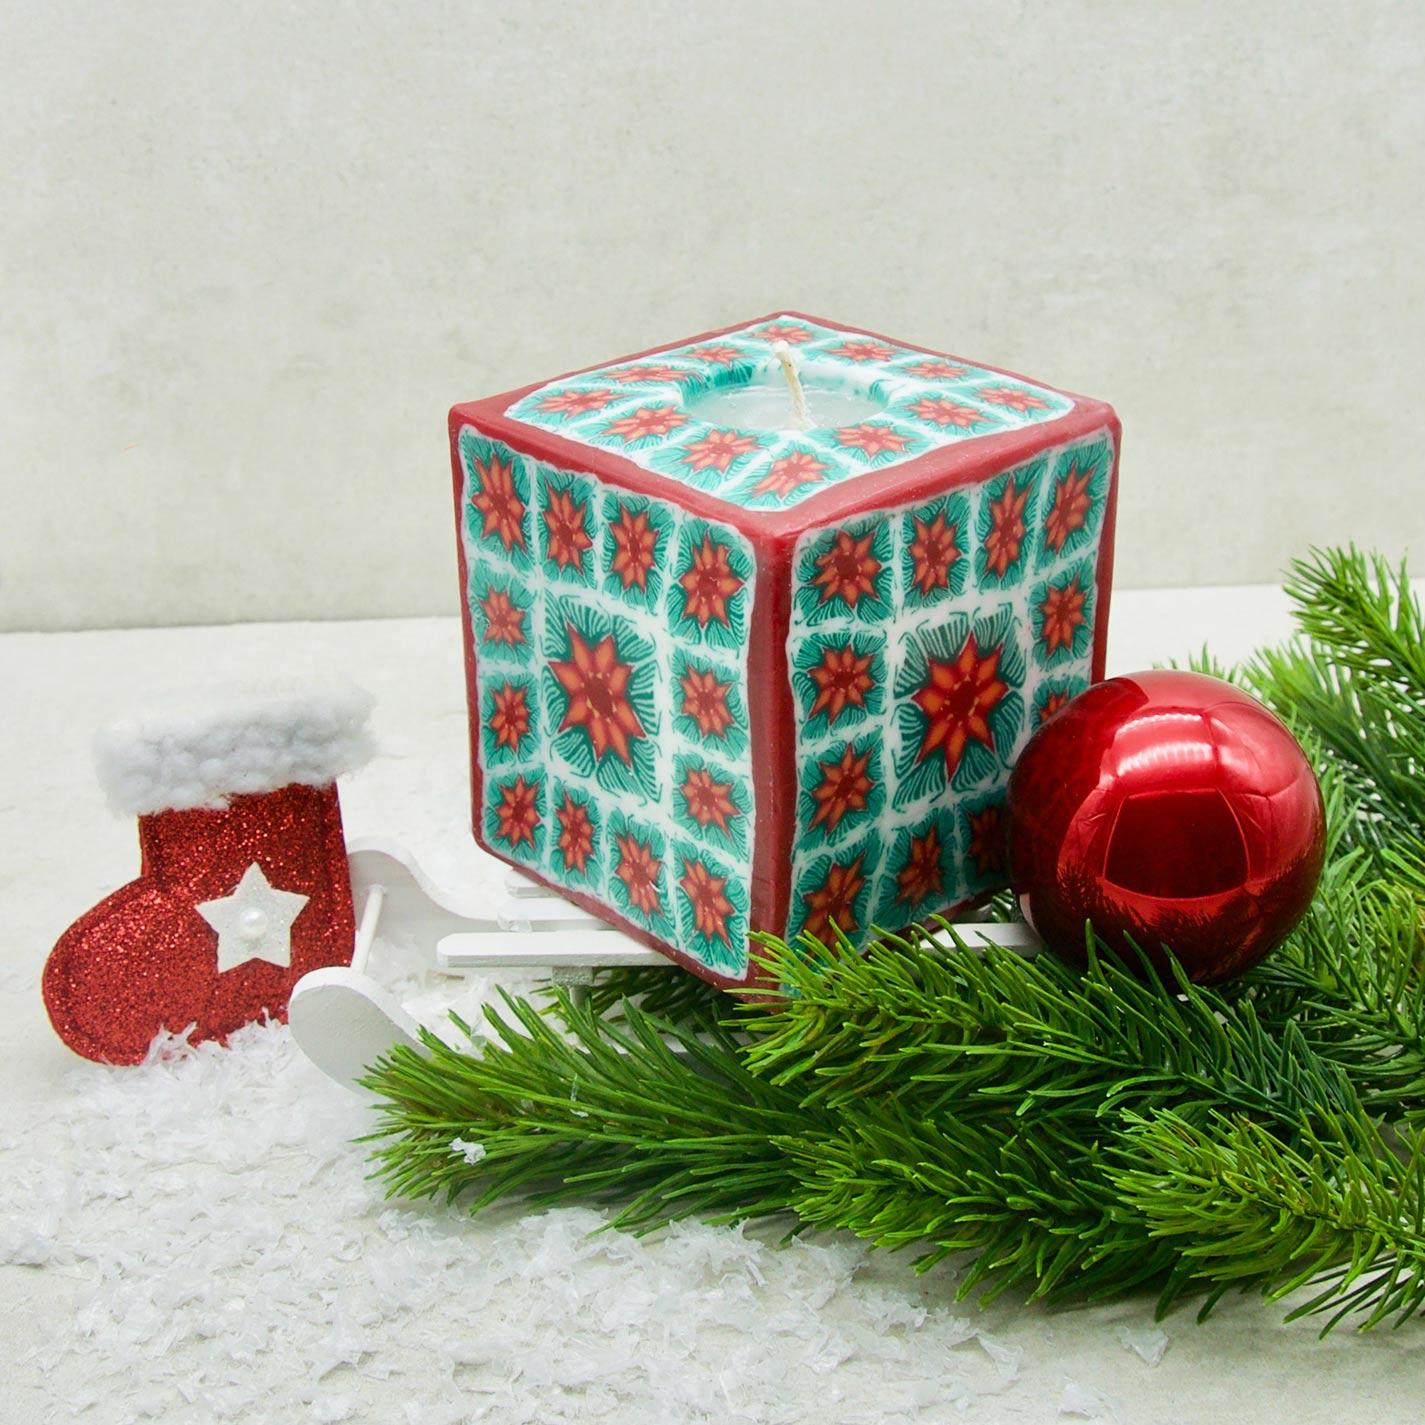 Kerze; Swazi Candle; Form: Würfel L ca. 9cmx9cmx9cm; Gewicht: ca. 640g; Farbe: rot/grün gewürfeltes Blumenmuster; Dekoration von Blueowl